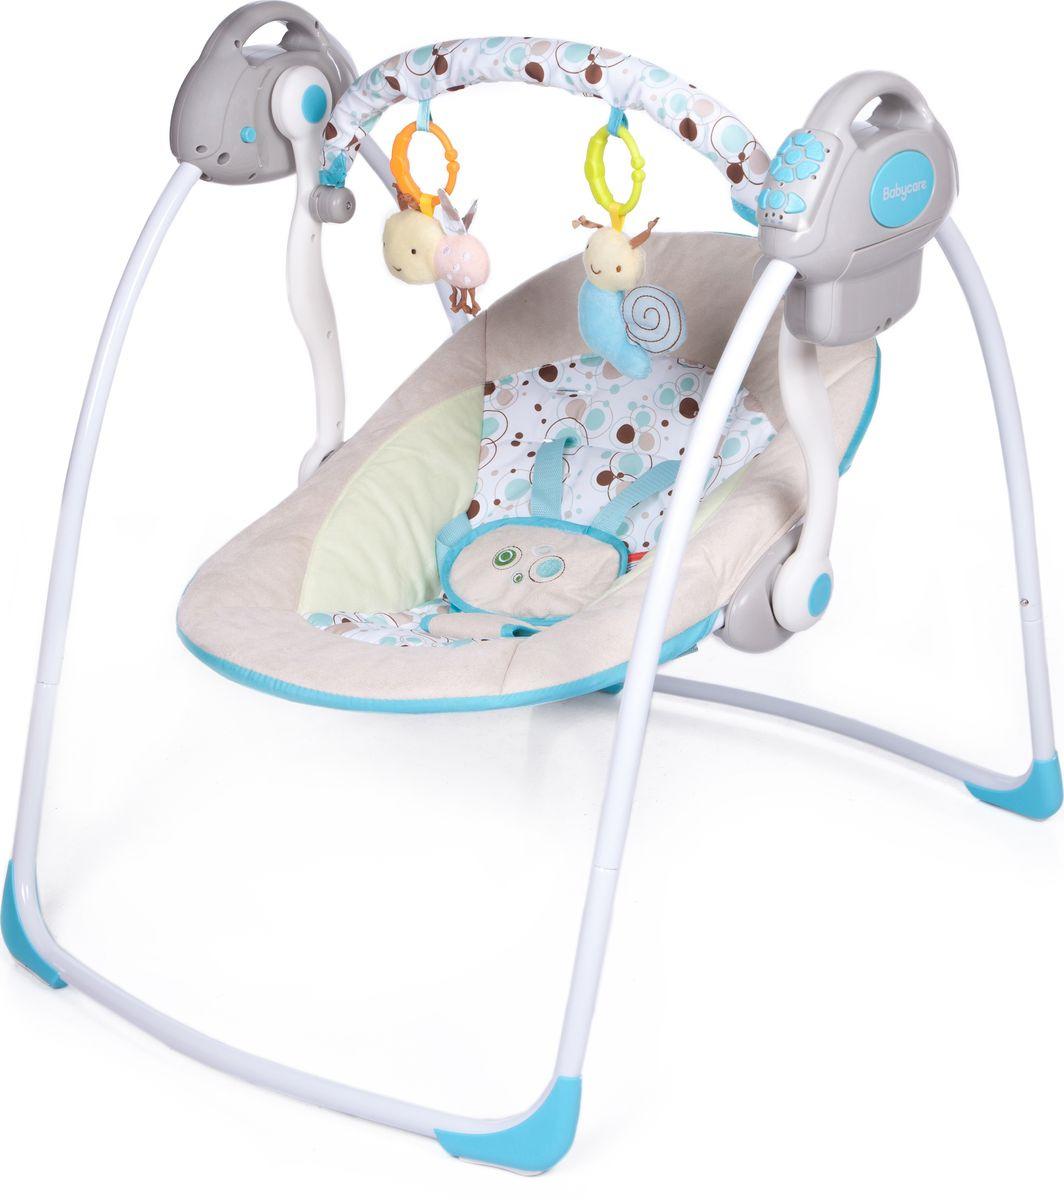 Электрокачели Baby Care Riva, с адаптером, цвет: шампанское